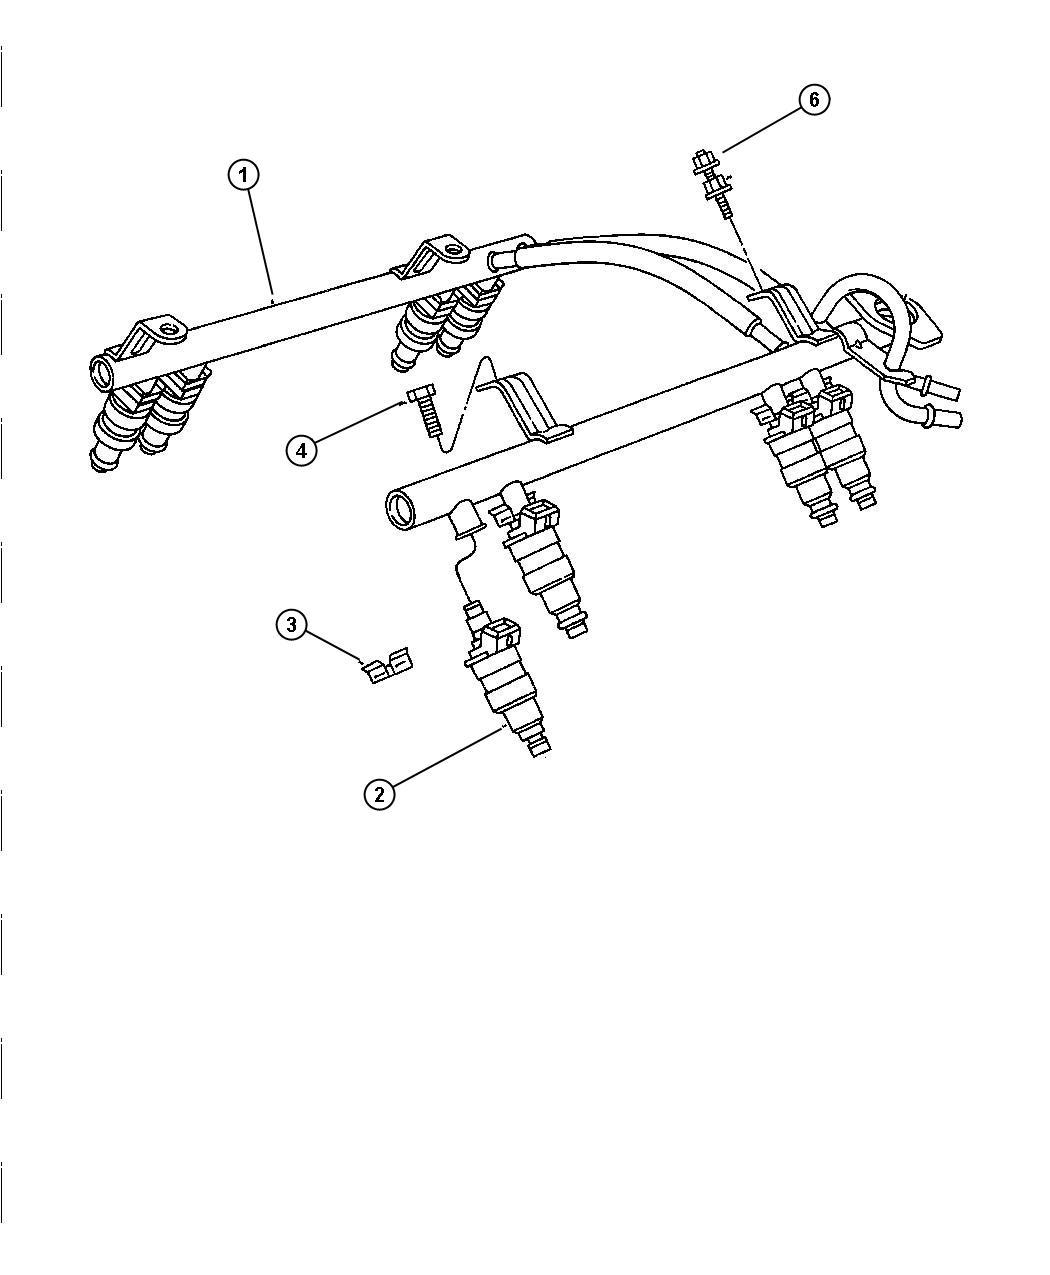 Jeep Grand Cherokee 4 7l V8 Power Tech Multi Speed Auto 45rfe Fuel Rail